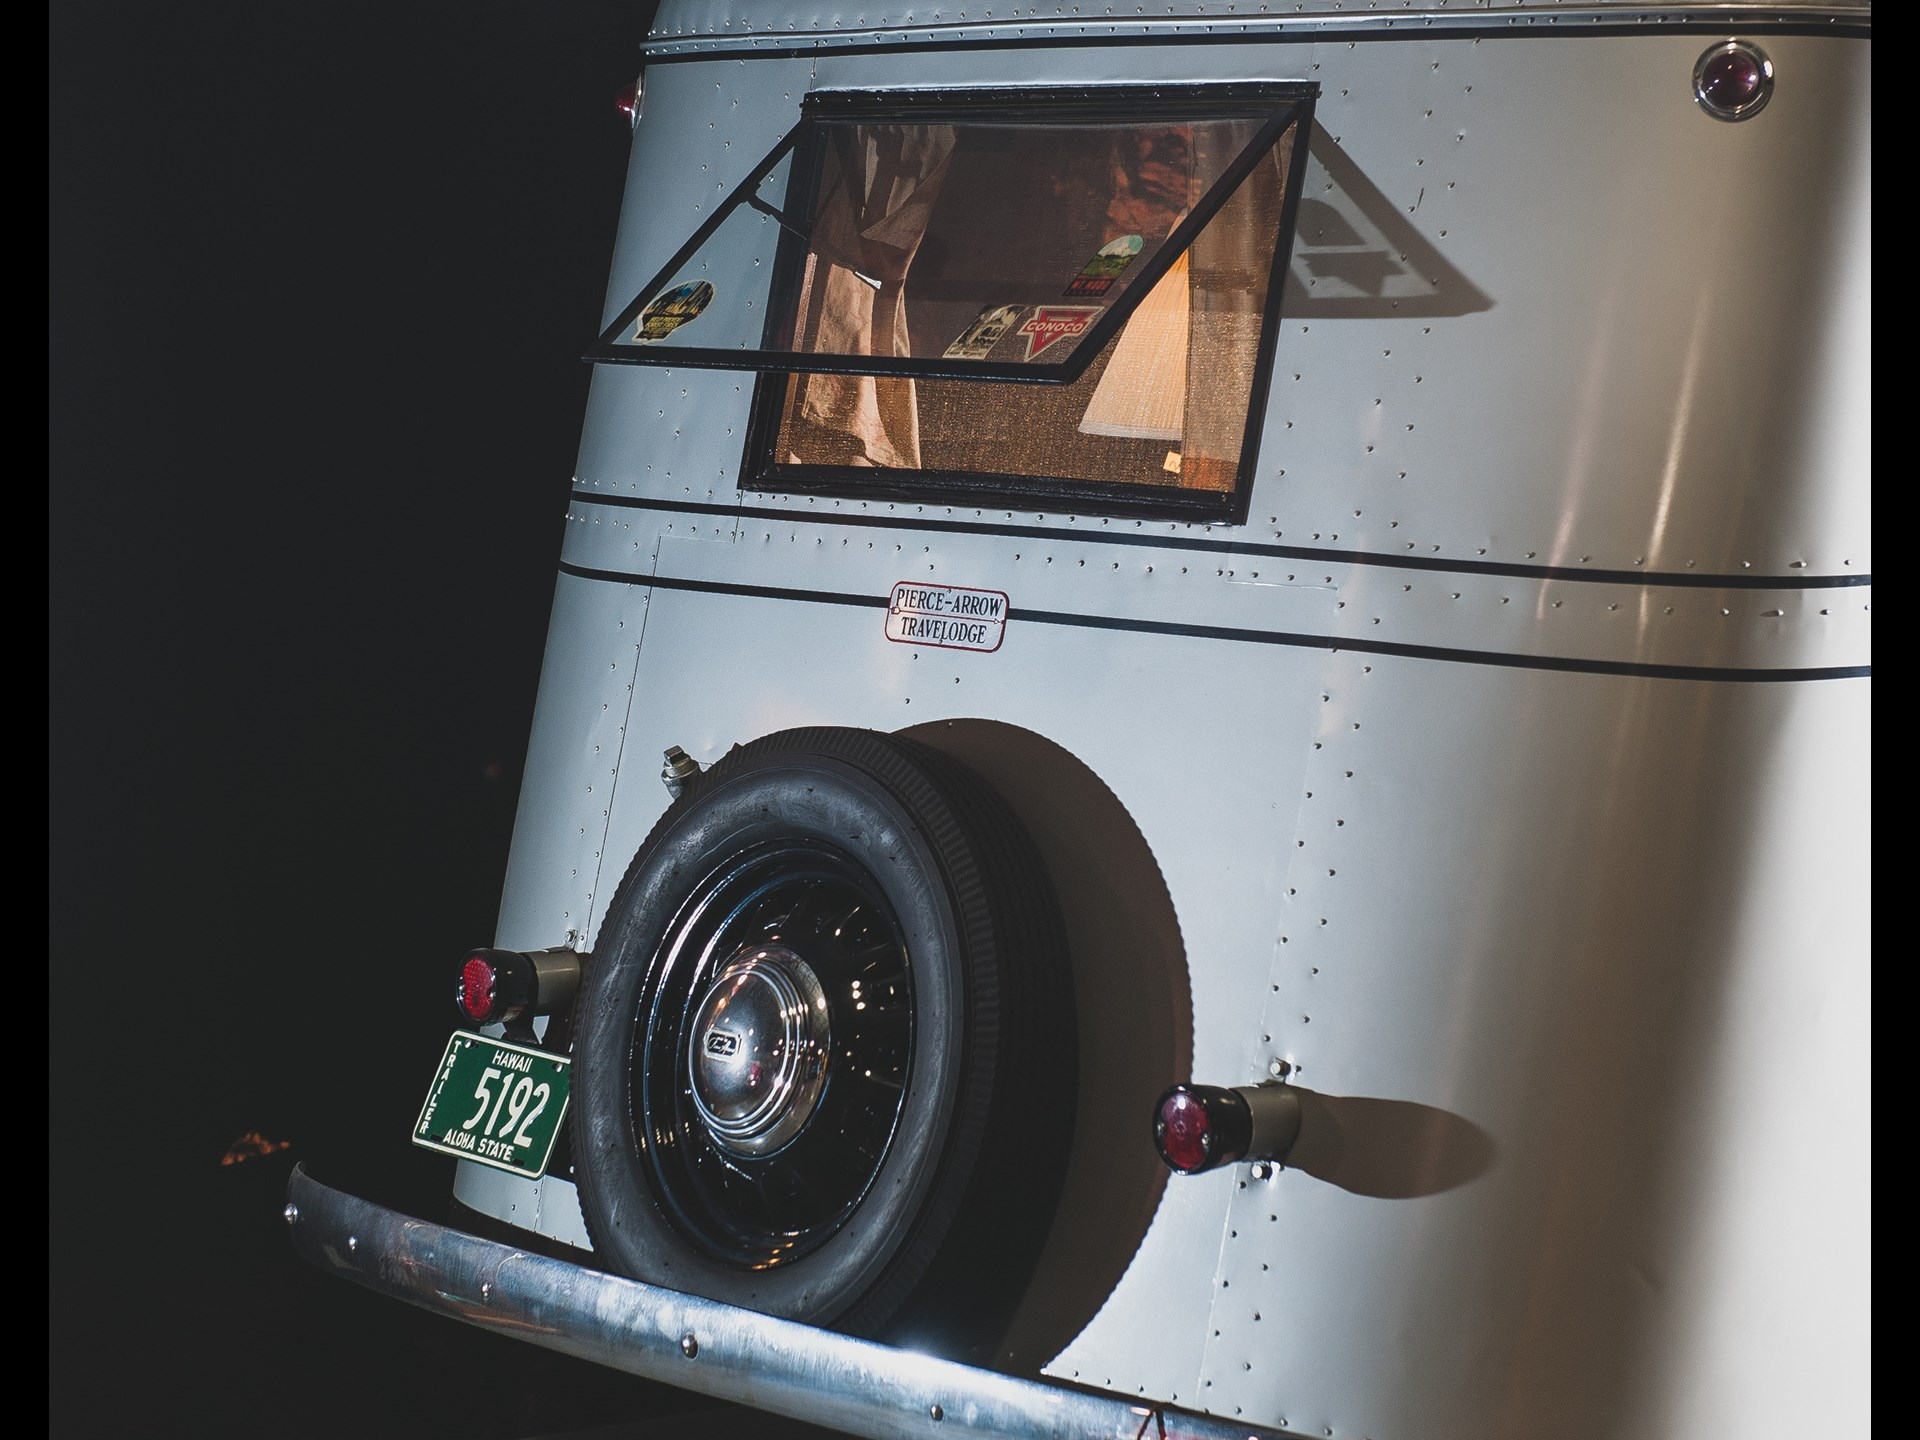 1937 Pierce-Arrow Model C Travelodge rear window and tire